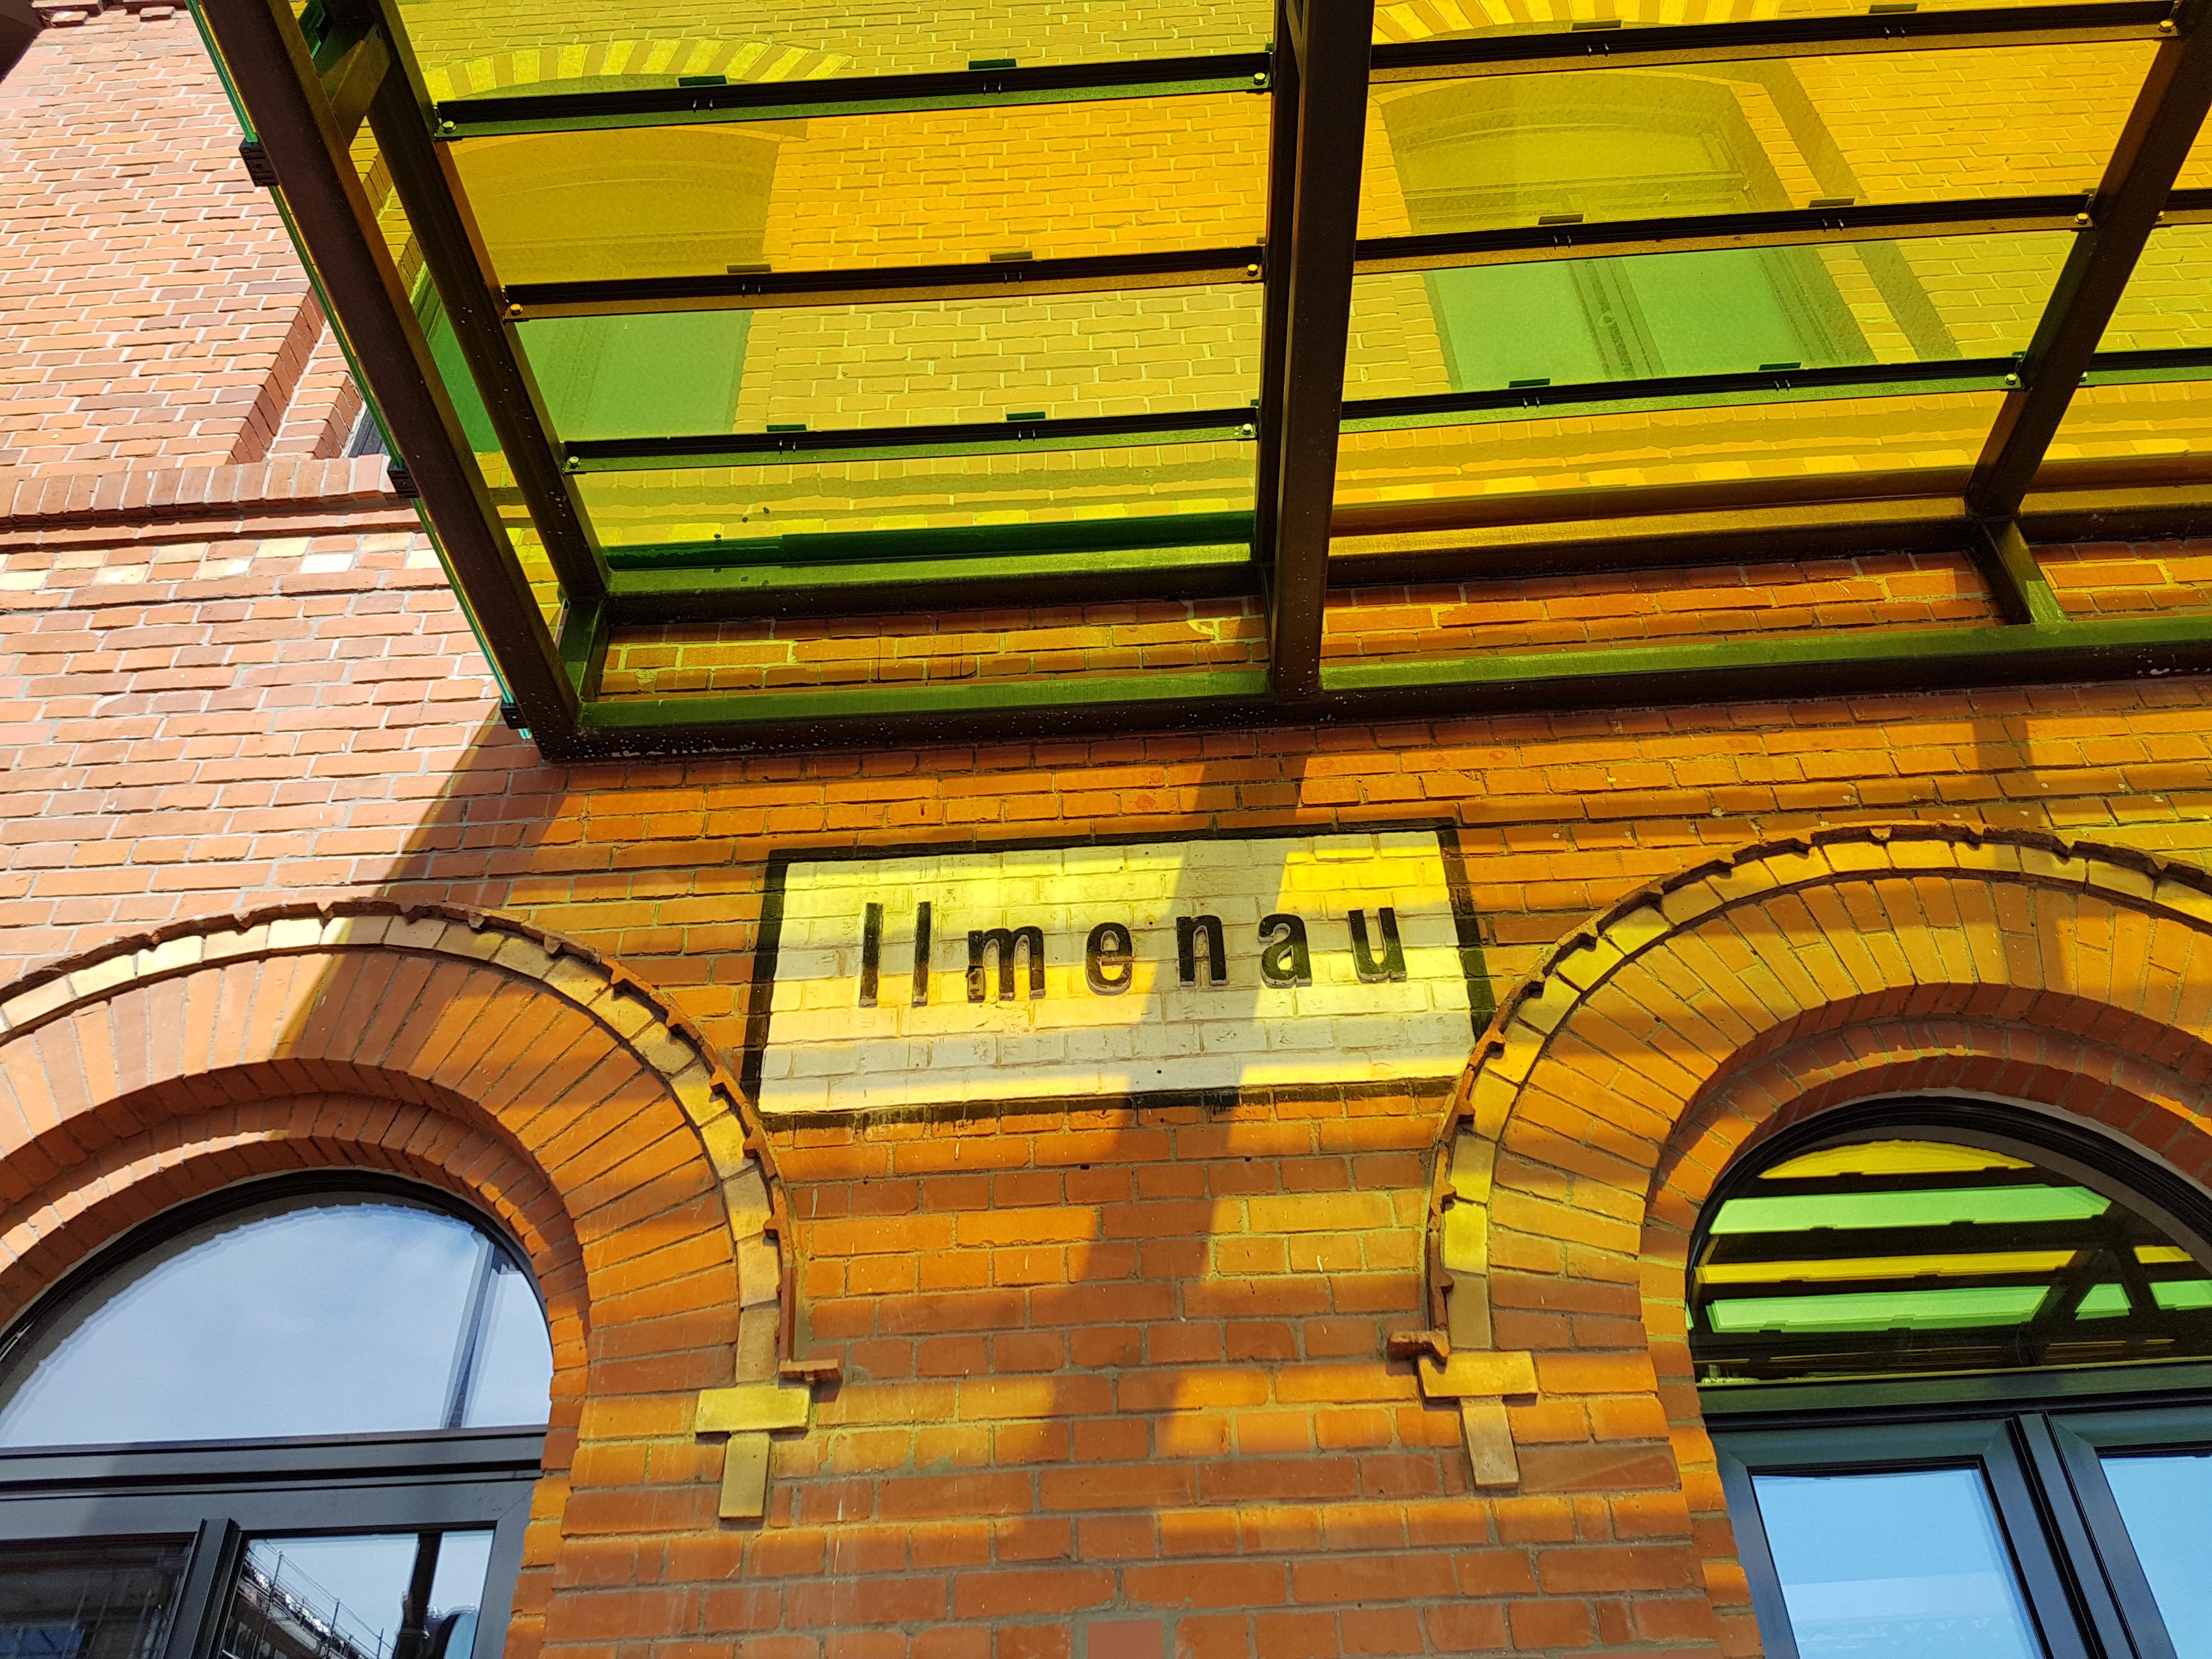 Am Bahnhof Ilmenau